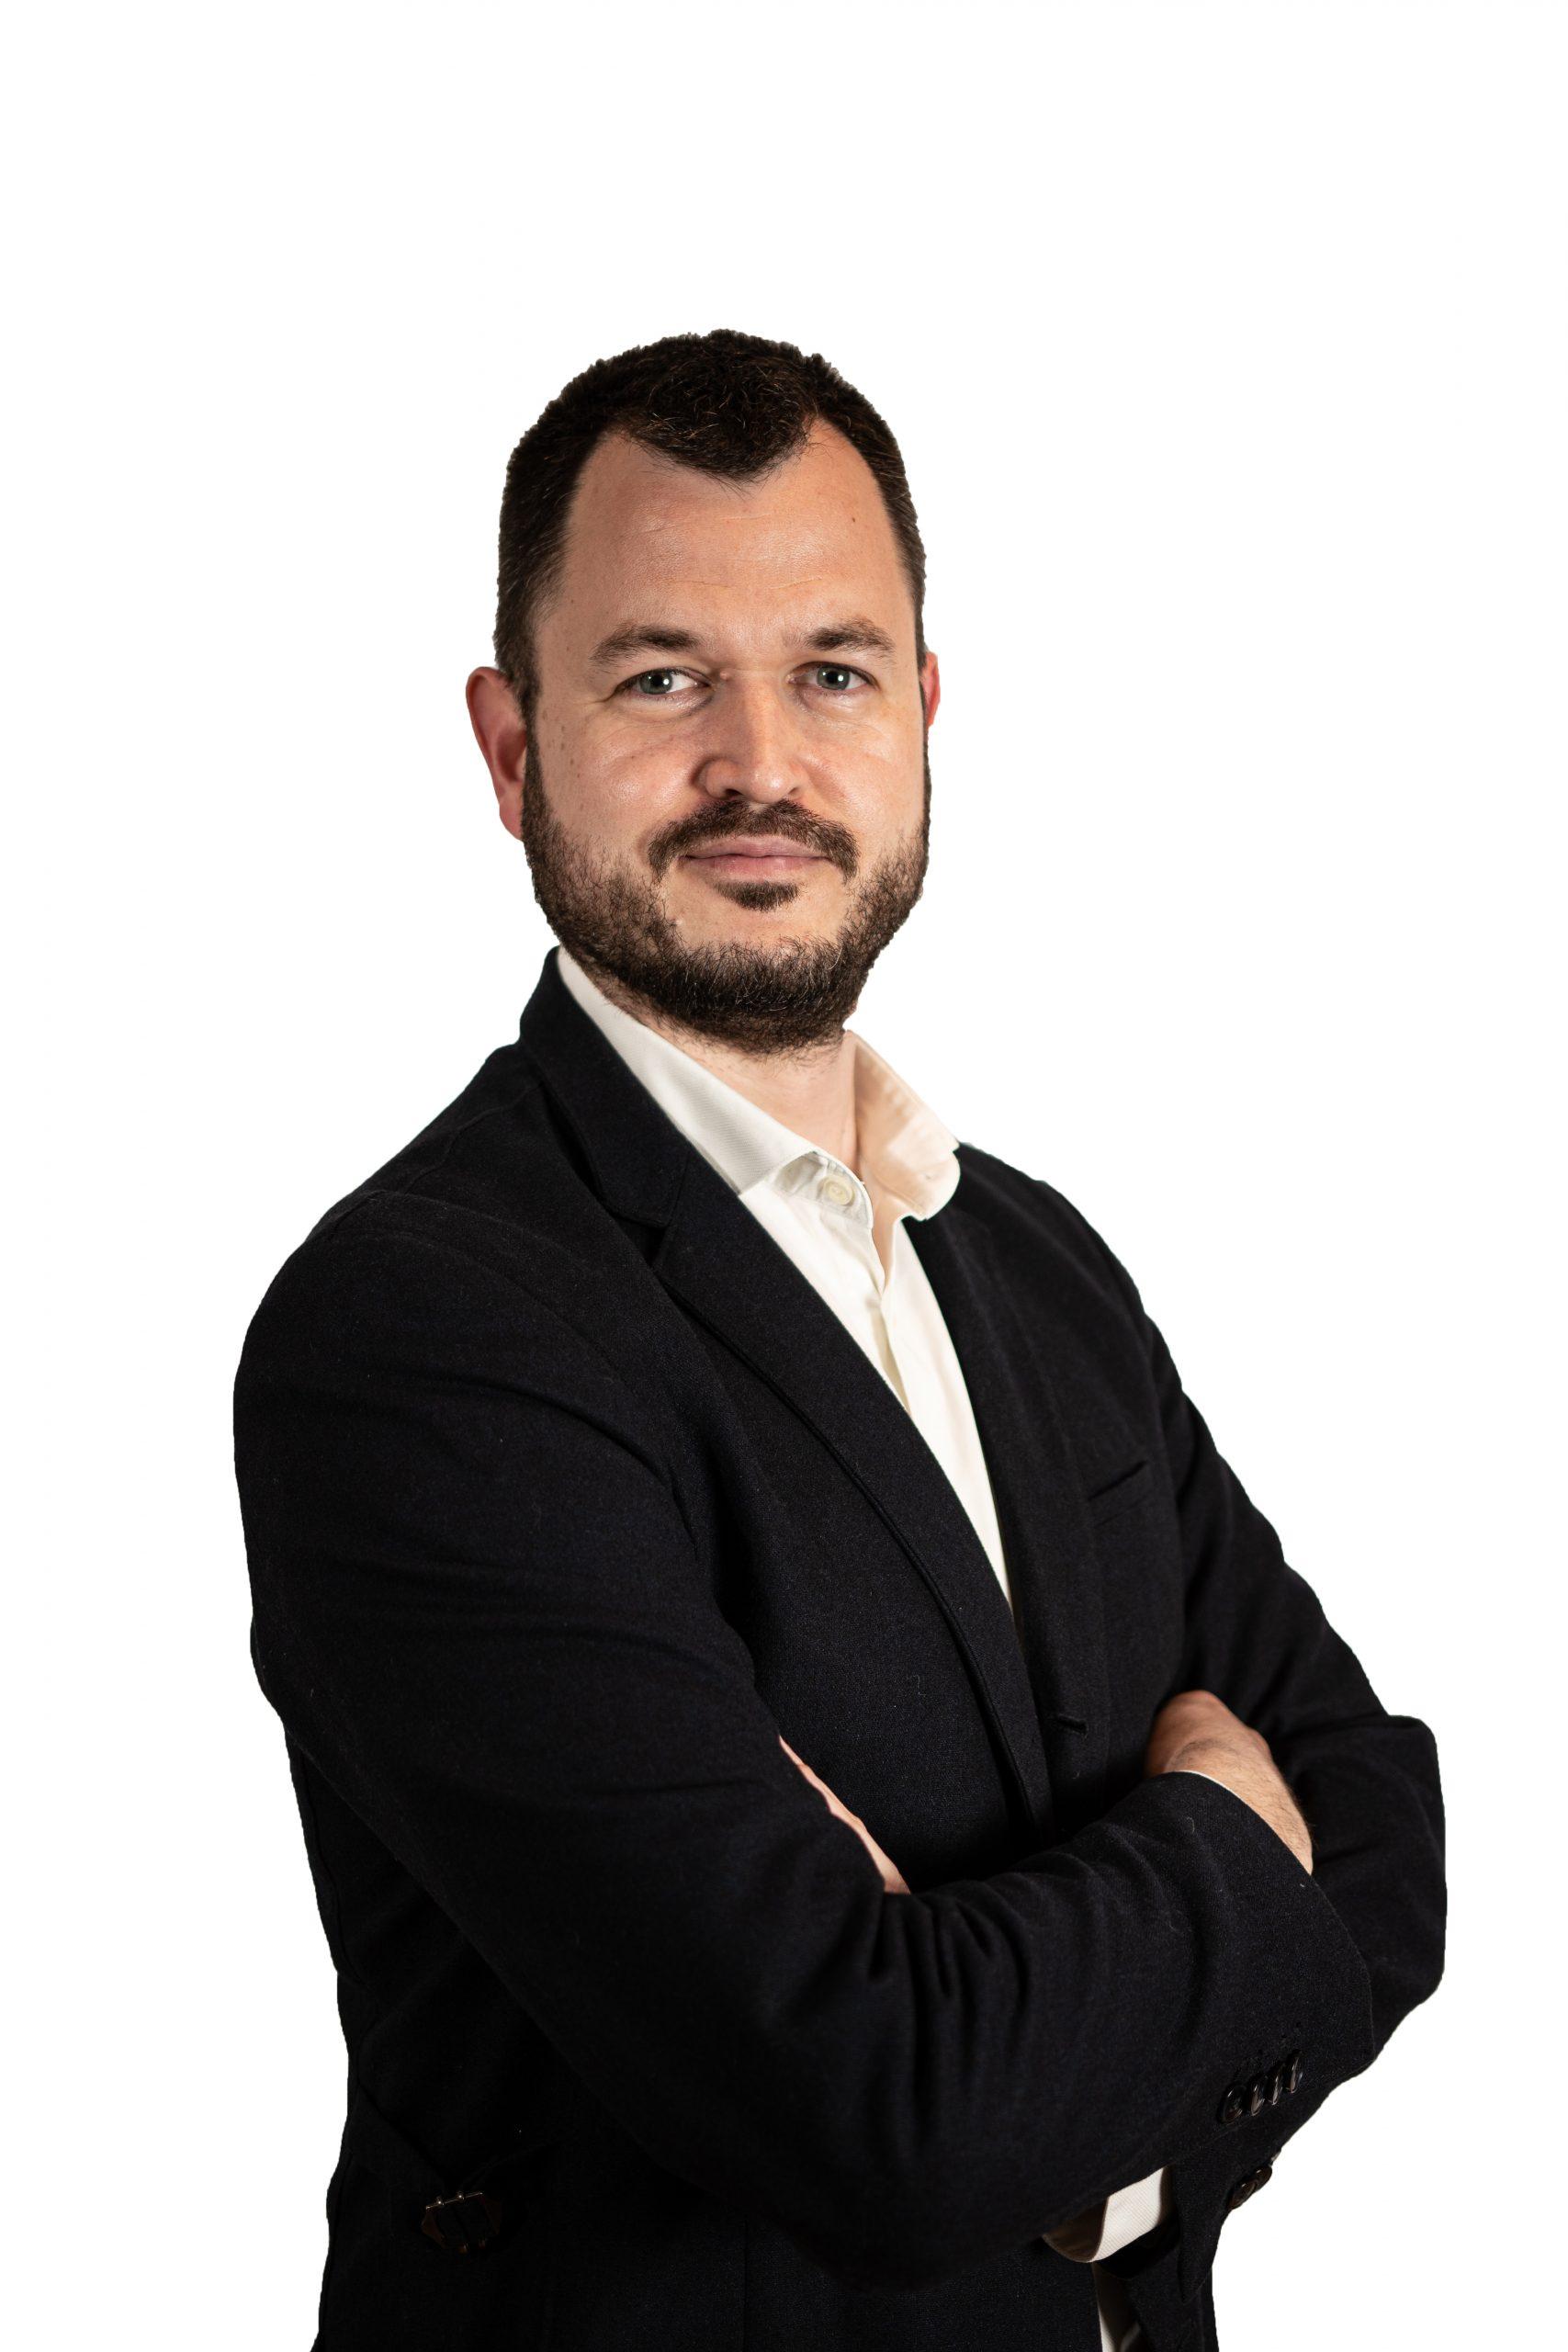 Axel Blumenberg headshot